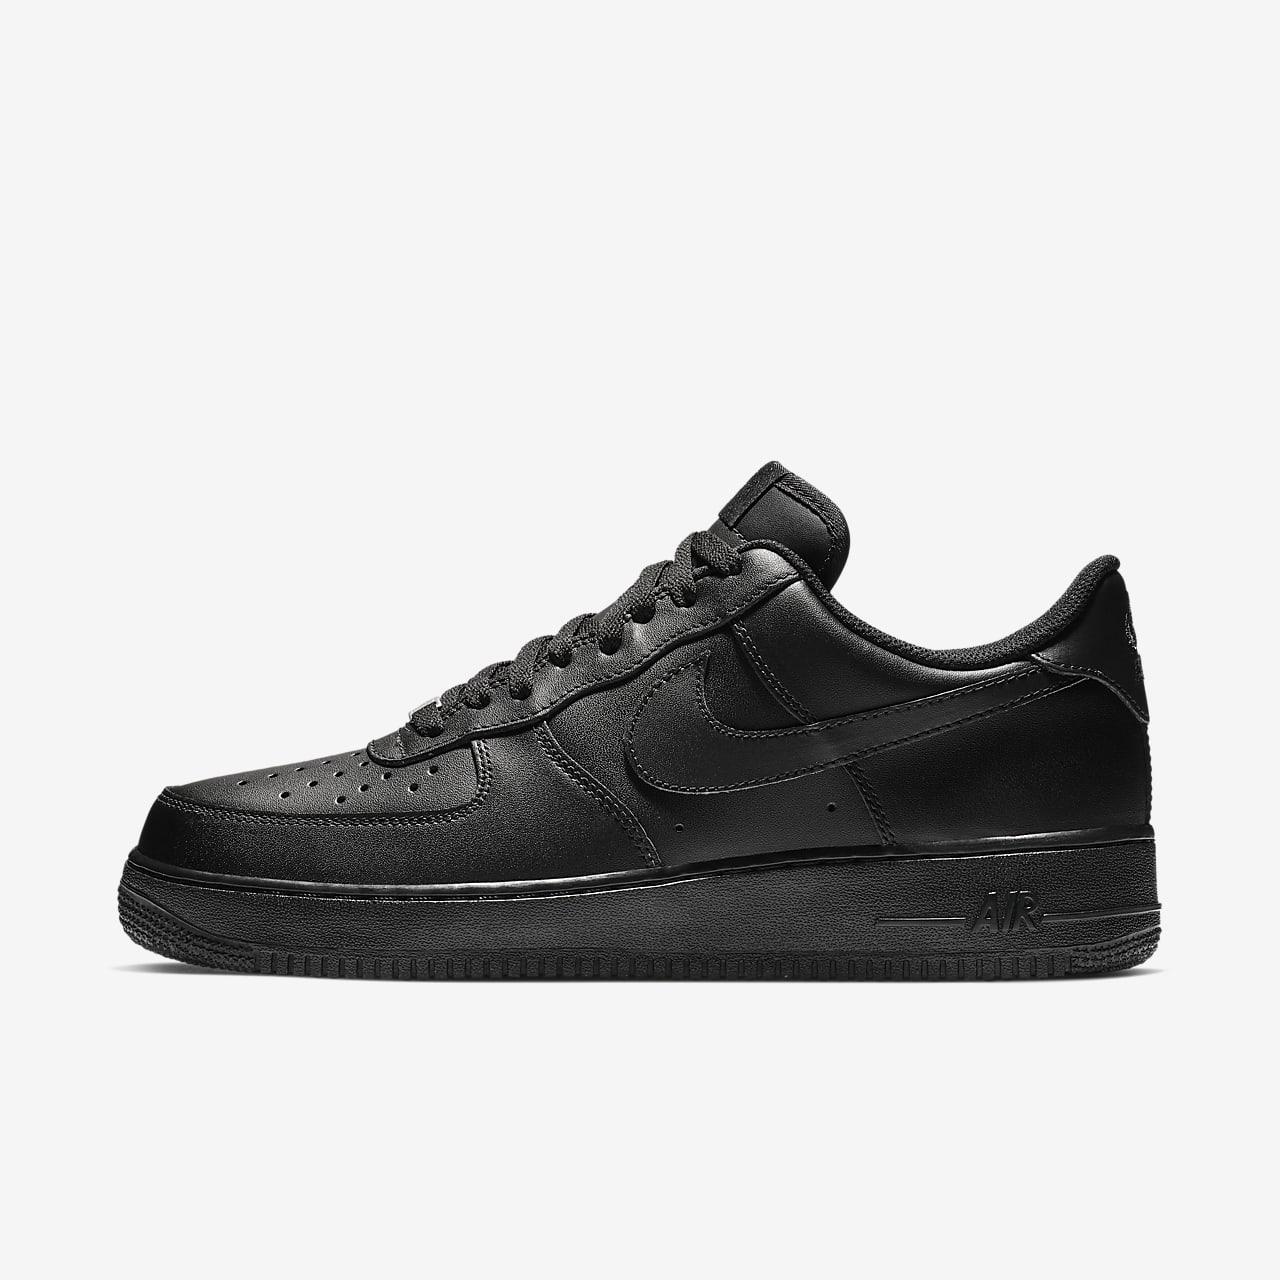 nike air force 1 07 2 scarpe da basket uomo